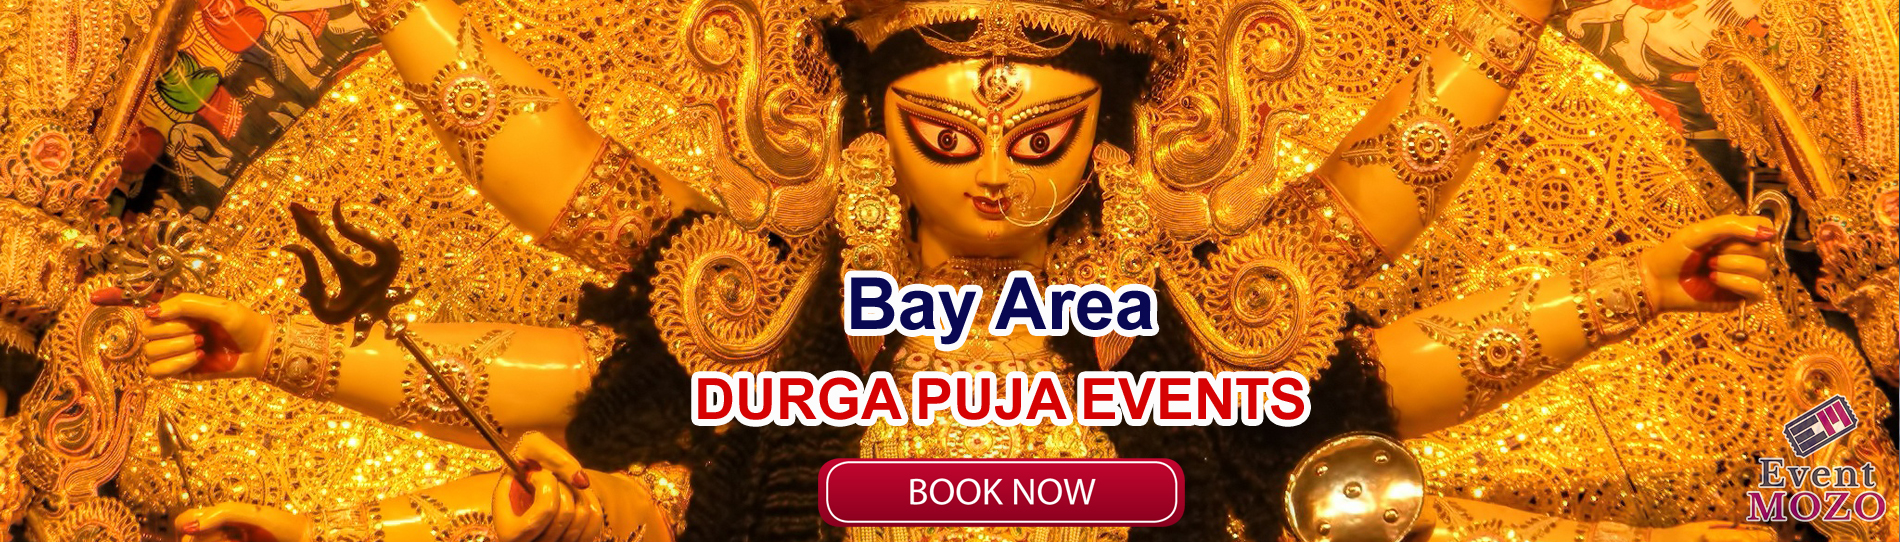 EventMozo Bay Area Durga Puja Events